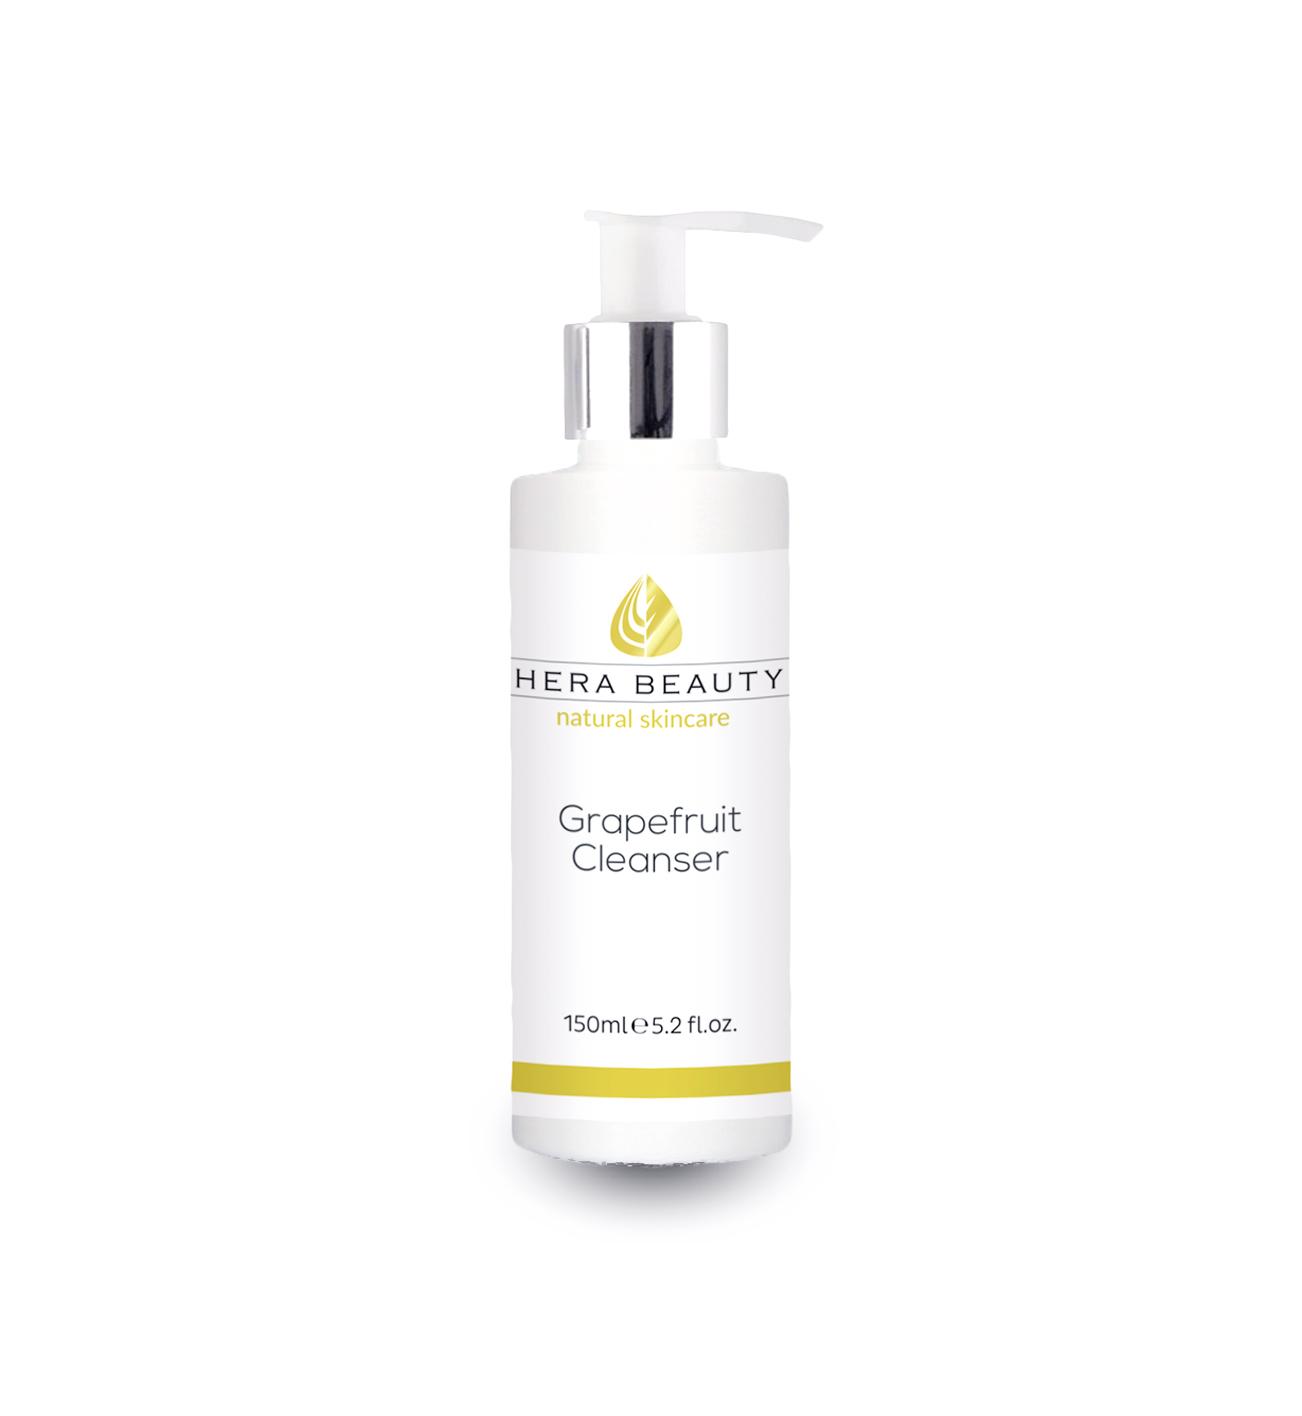 Grapefruit Cleanser Rr Private Label Skincare Manufacturer